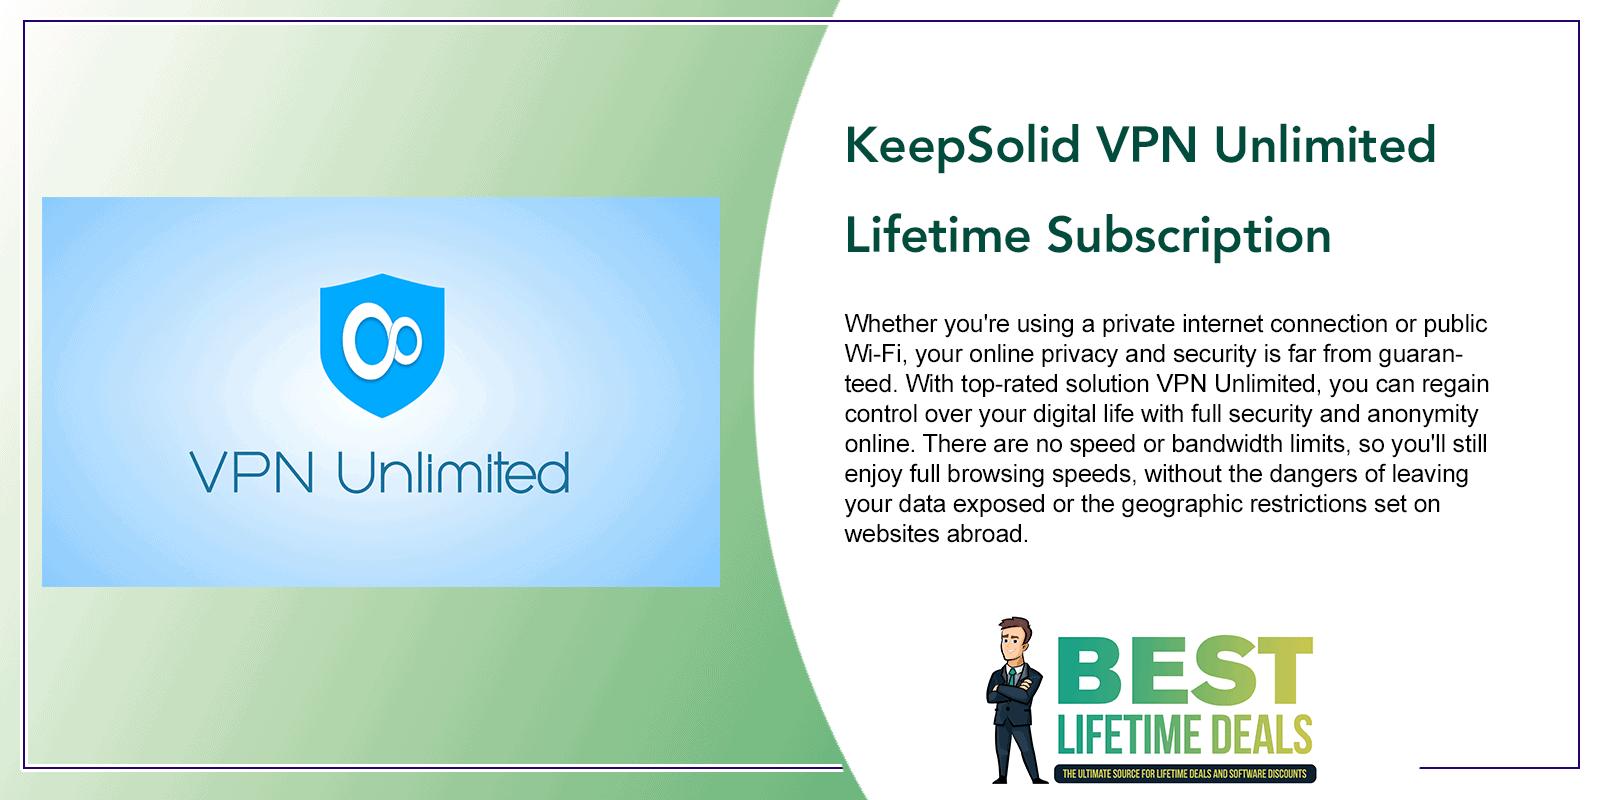 KeepSolid VPN Unlimited Lifetime Subscription Post Image